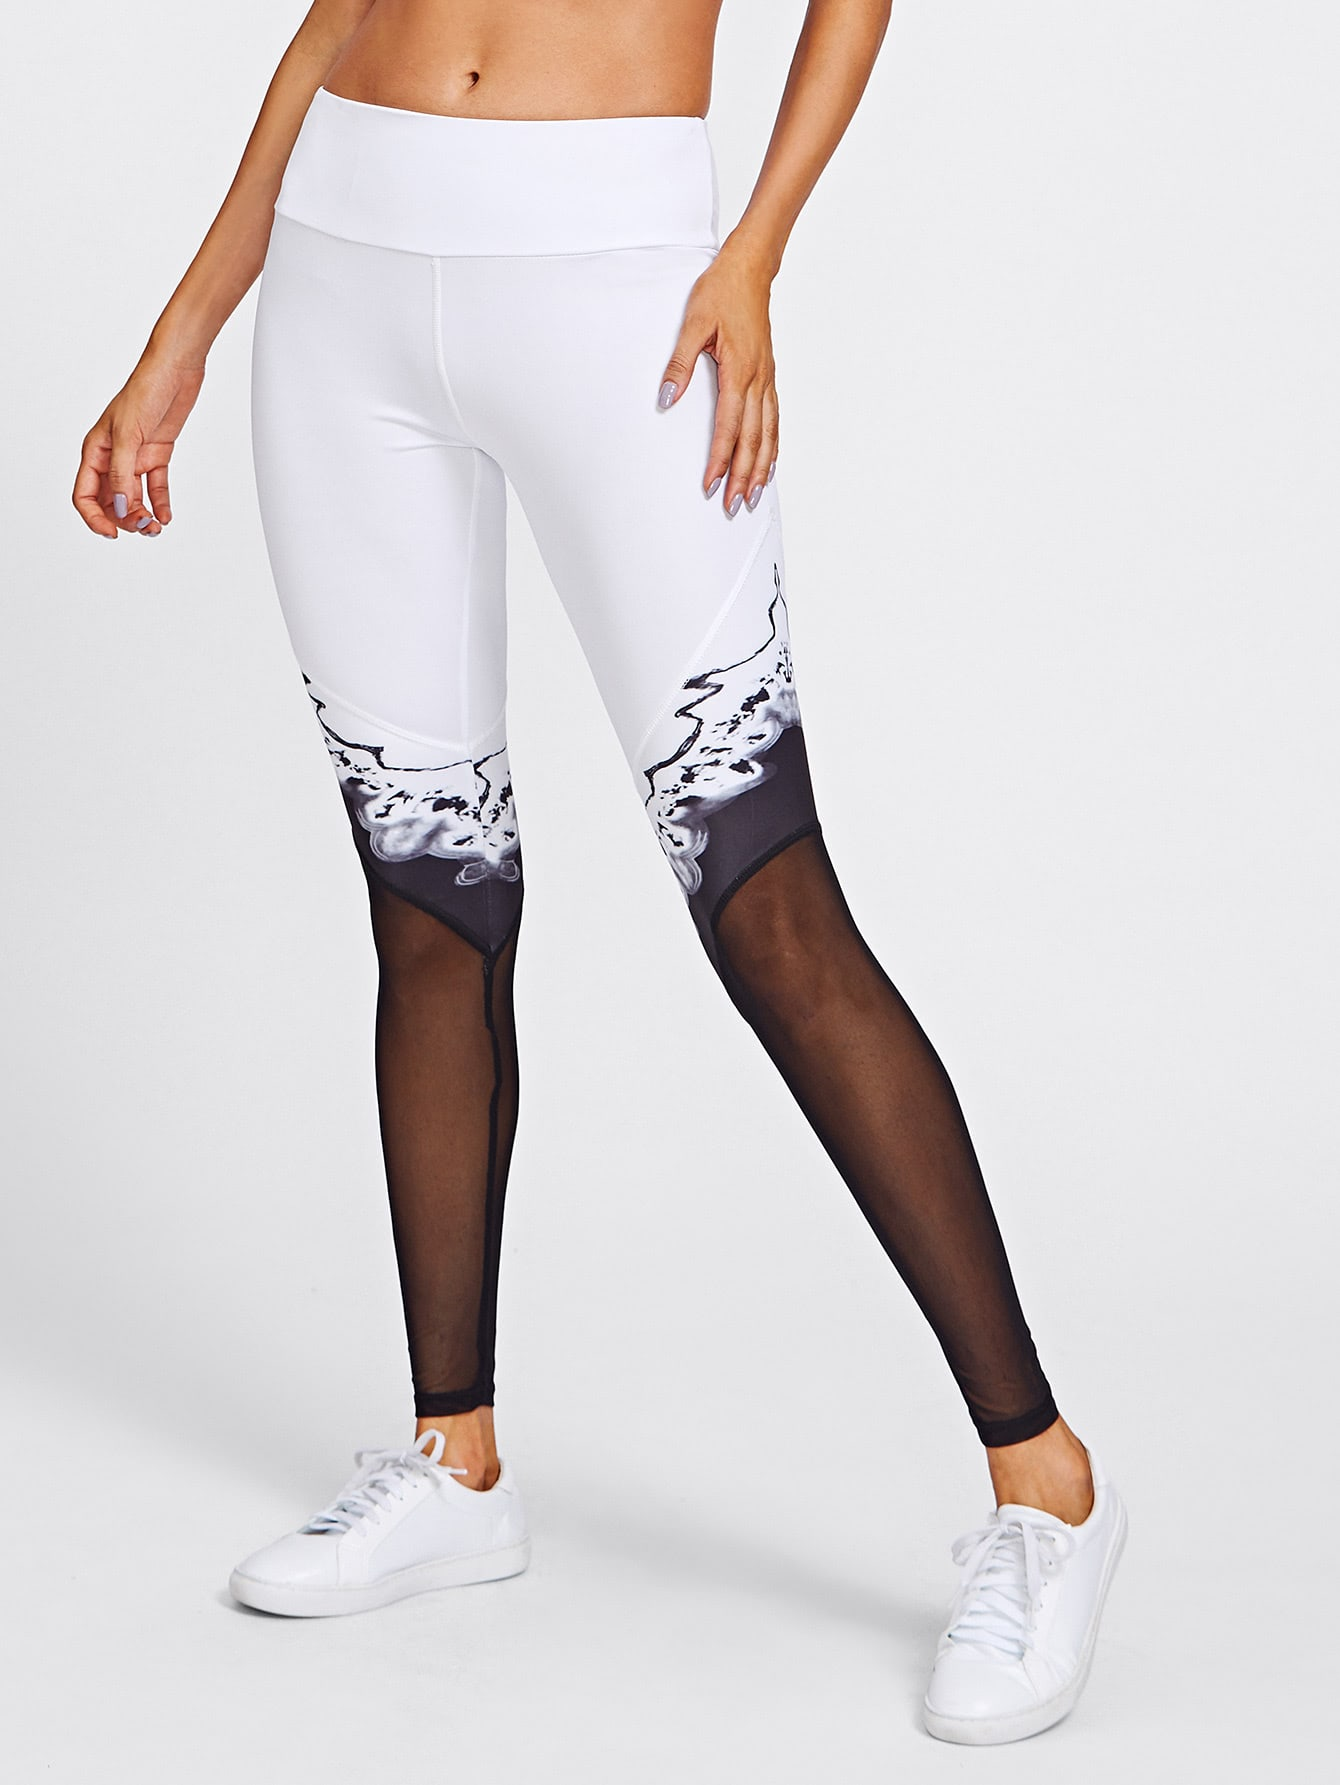 Active Mesh Paneled Leggings leggings170822302